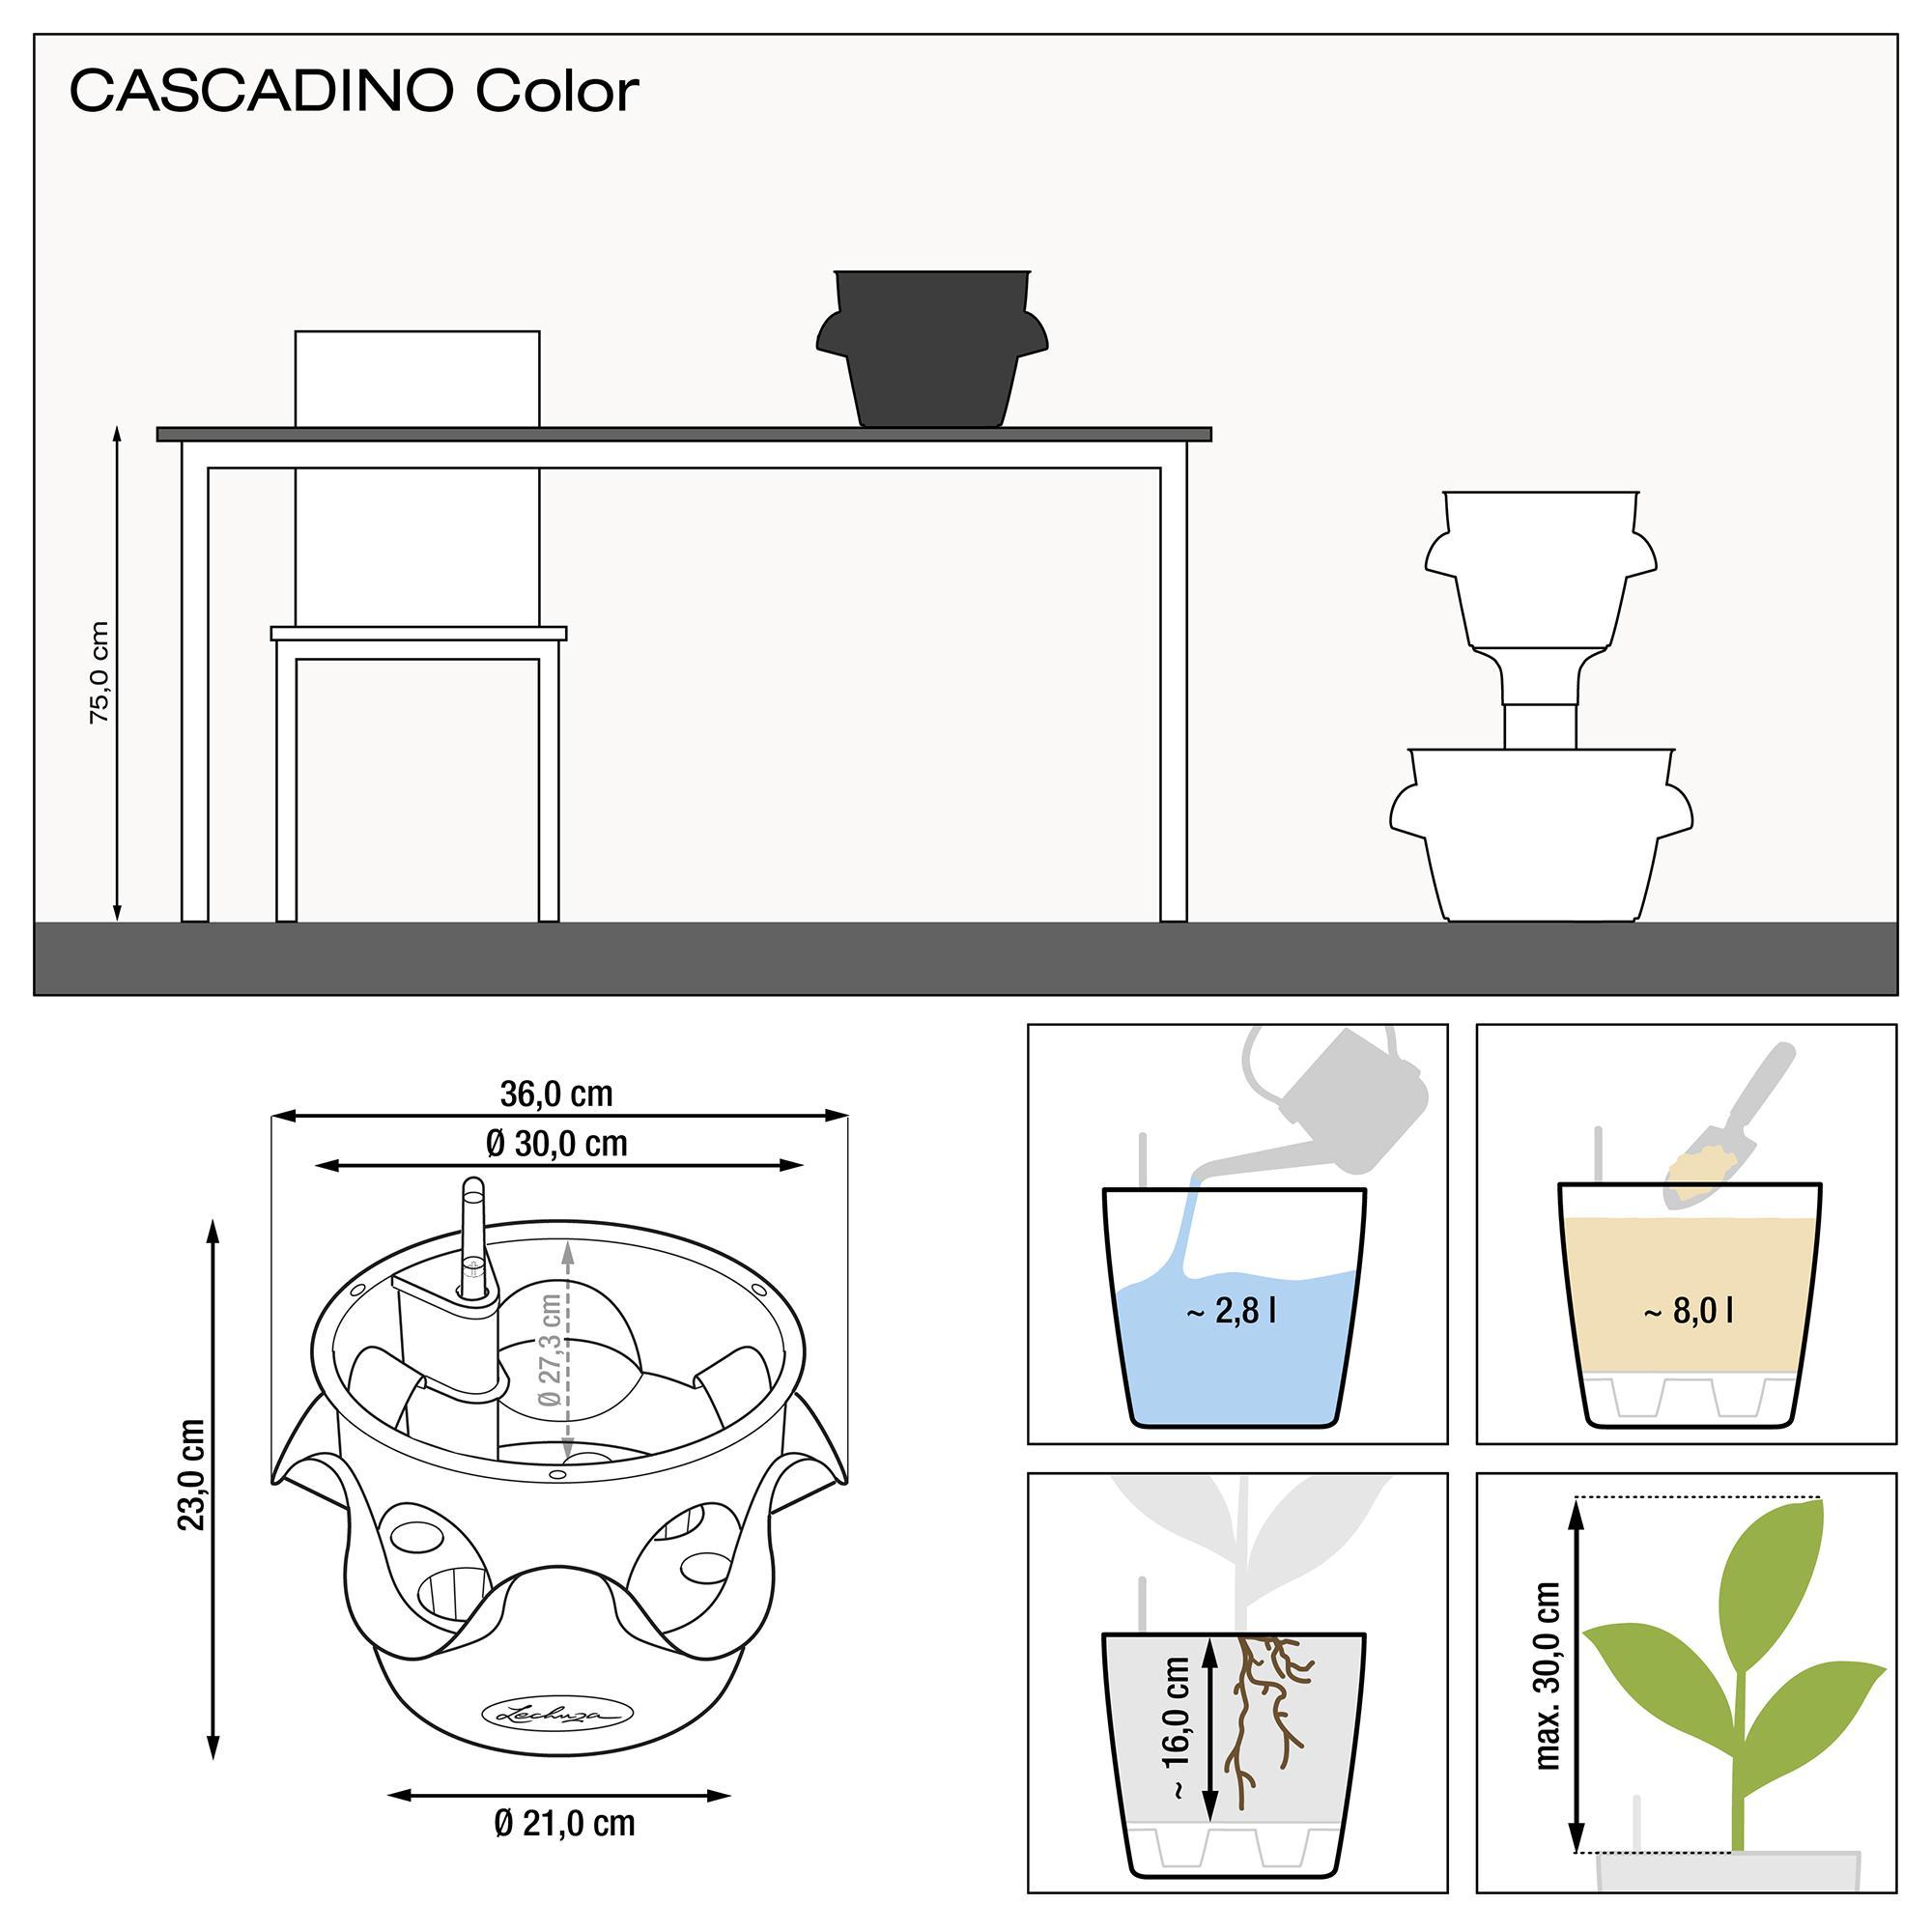 CASCADINO Color vert pistache - Image 2